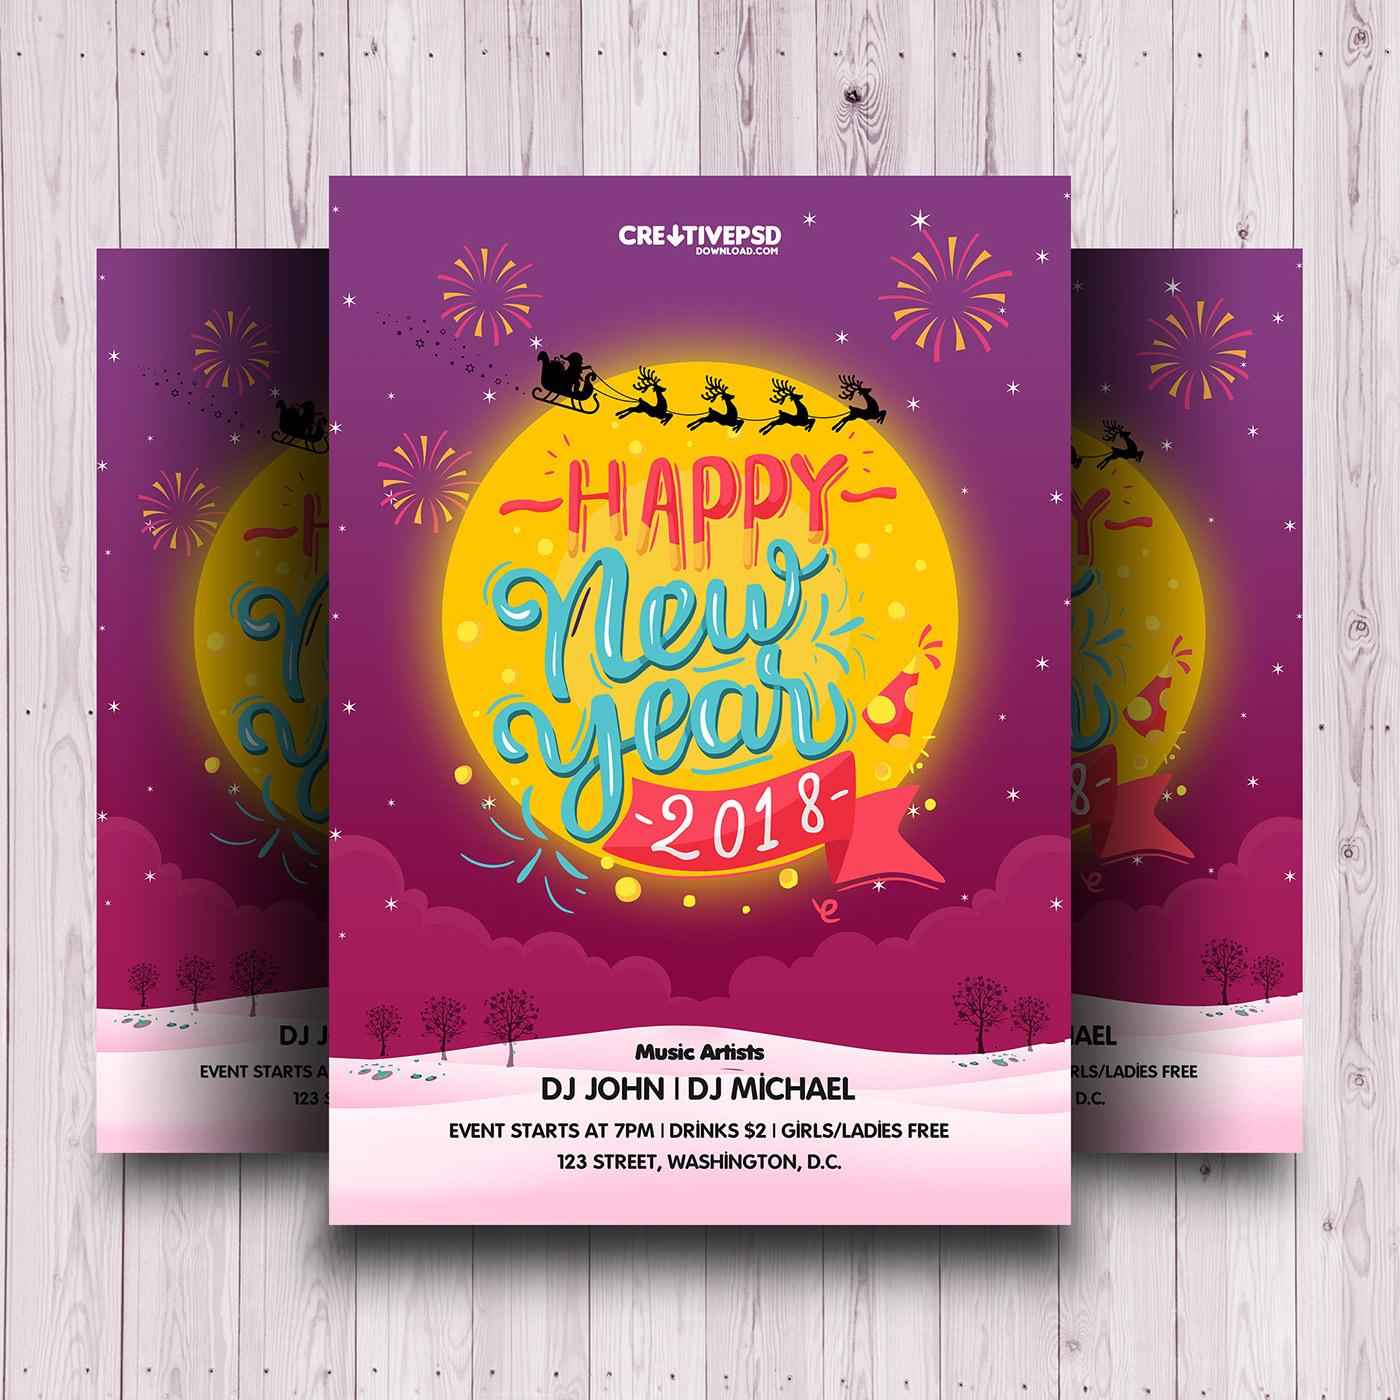 2018 happy new year invitation flyer psd on behance